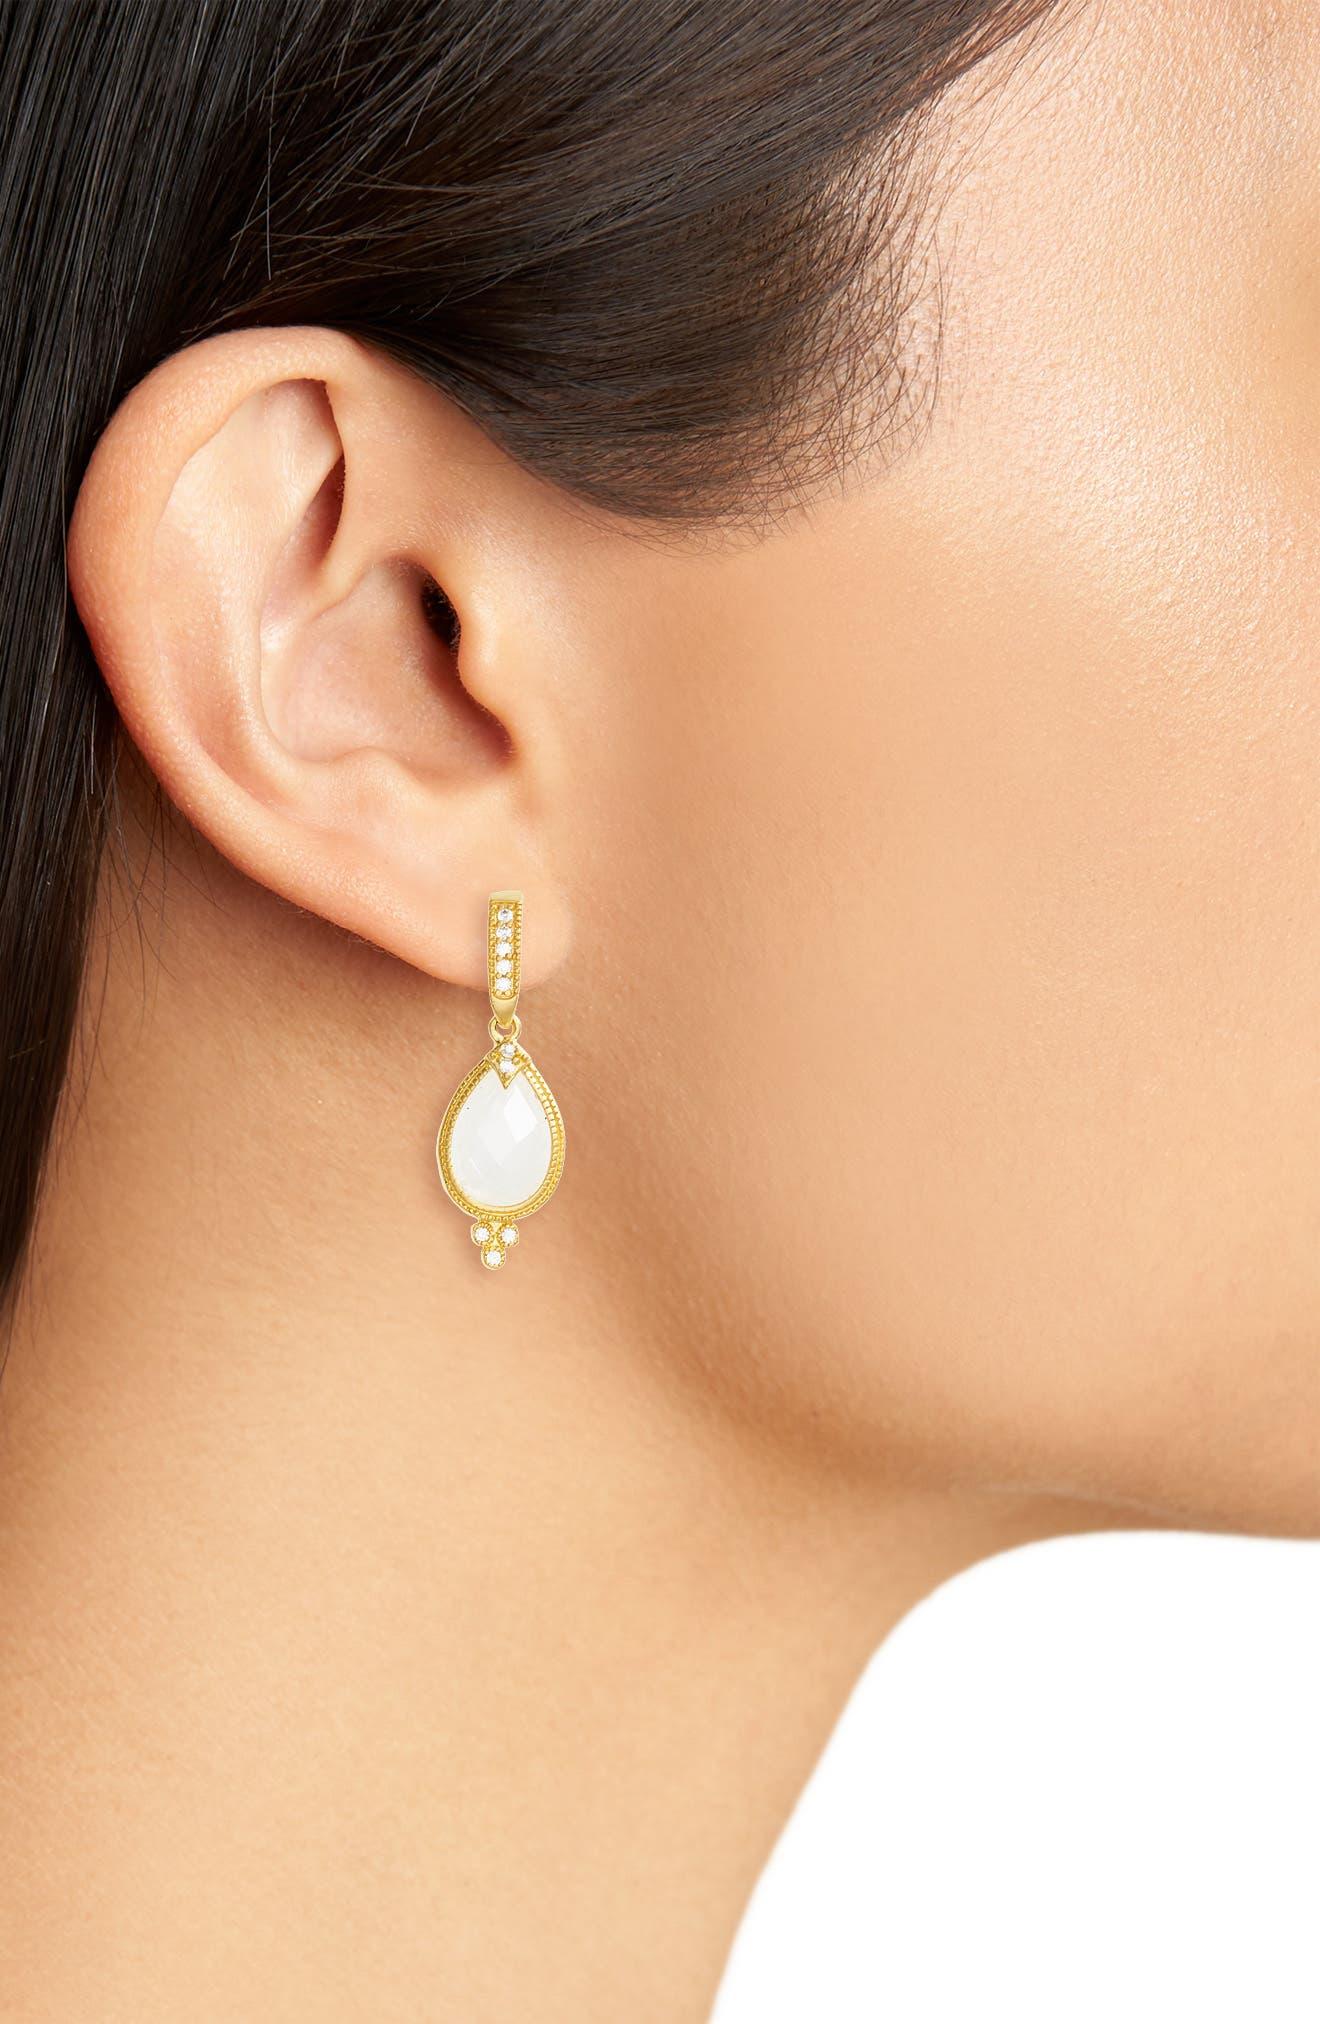 Audrey Teardrop Earrings,                             Alternate thumbnail 2, color,                             710